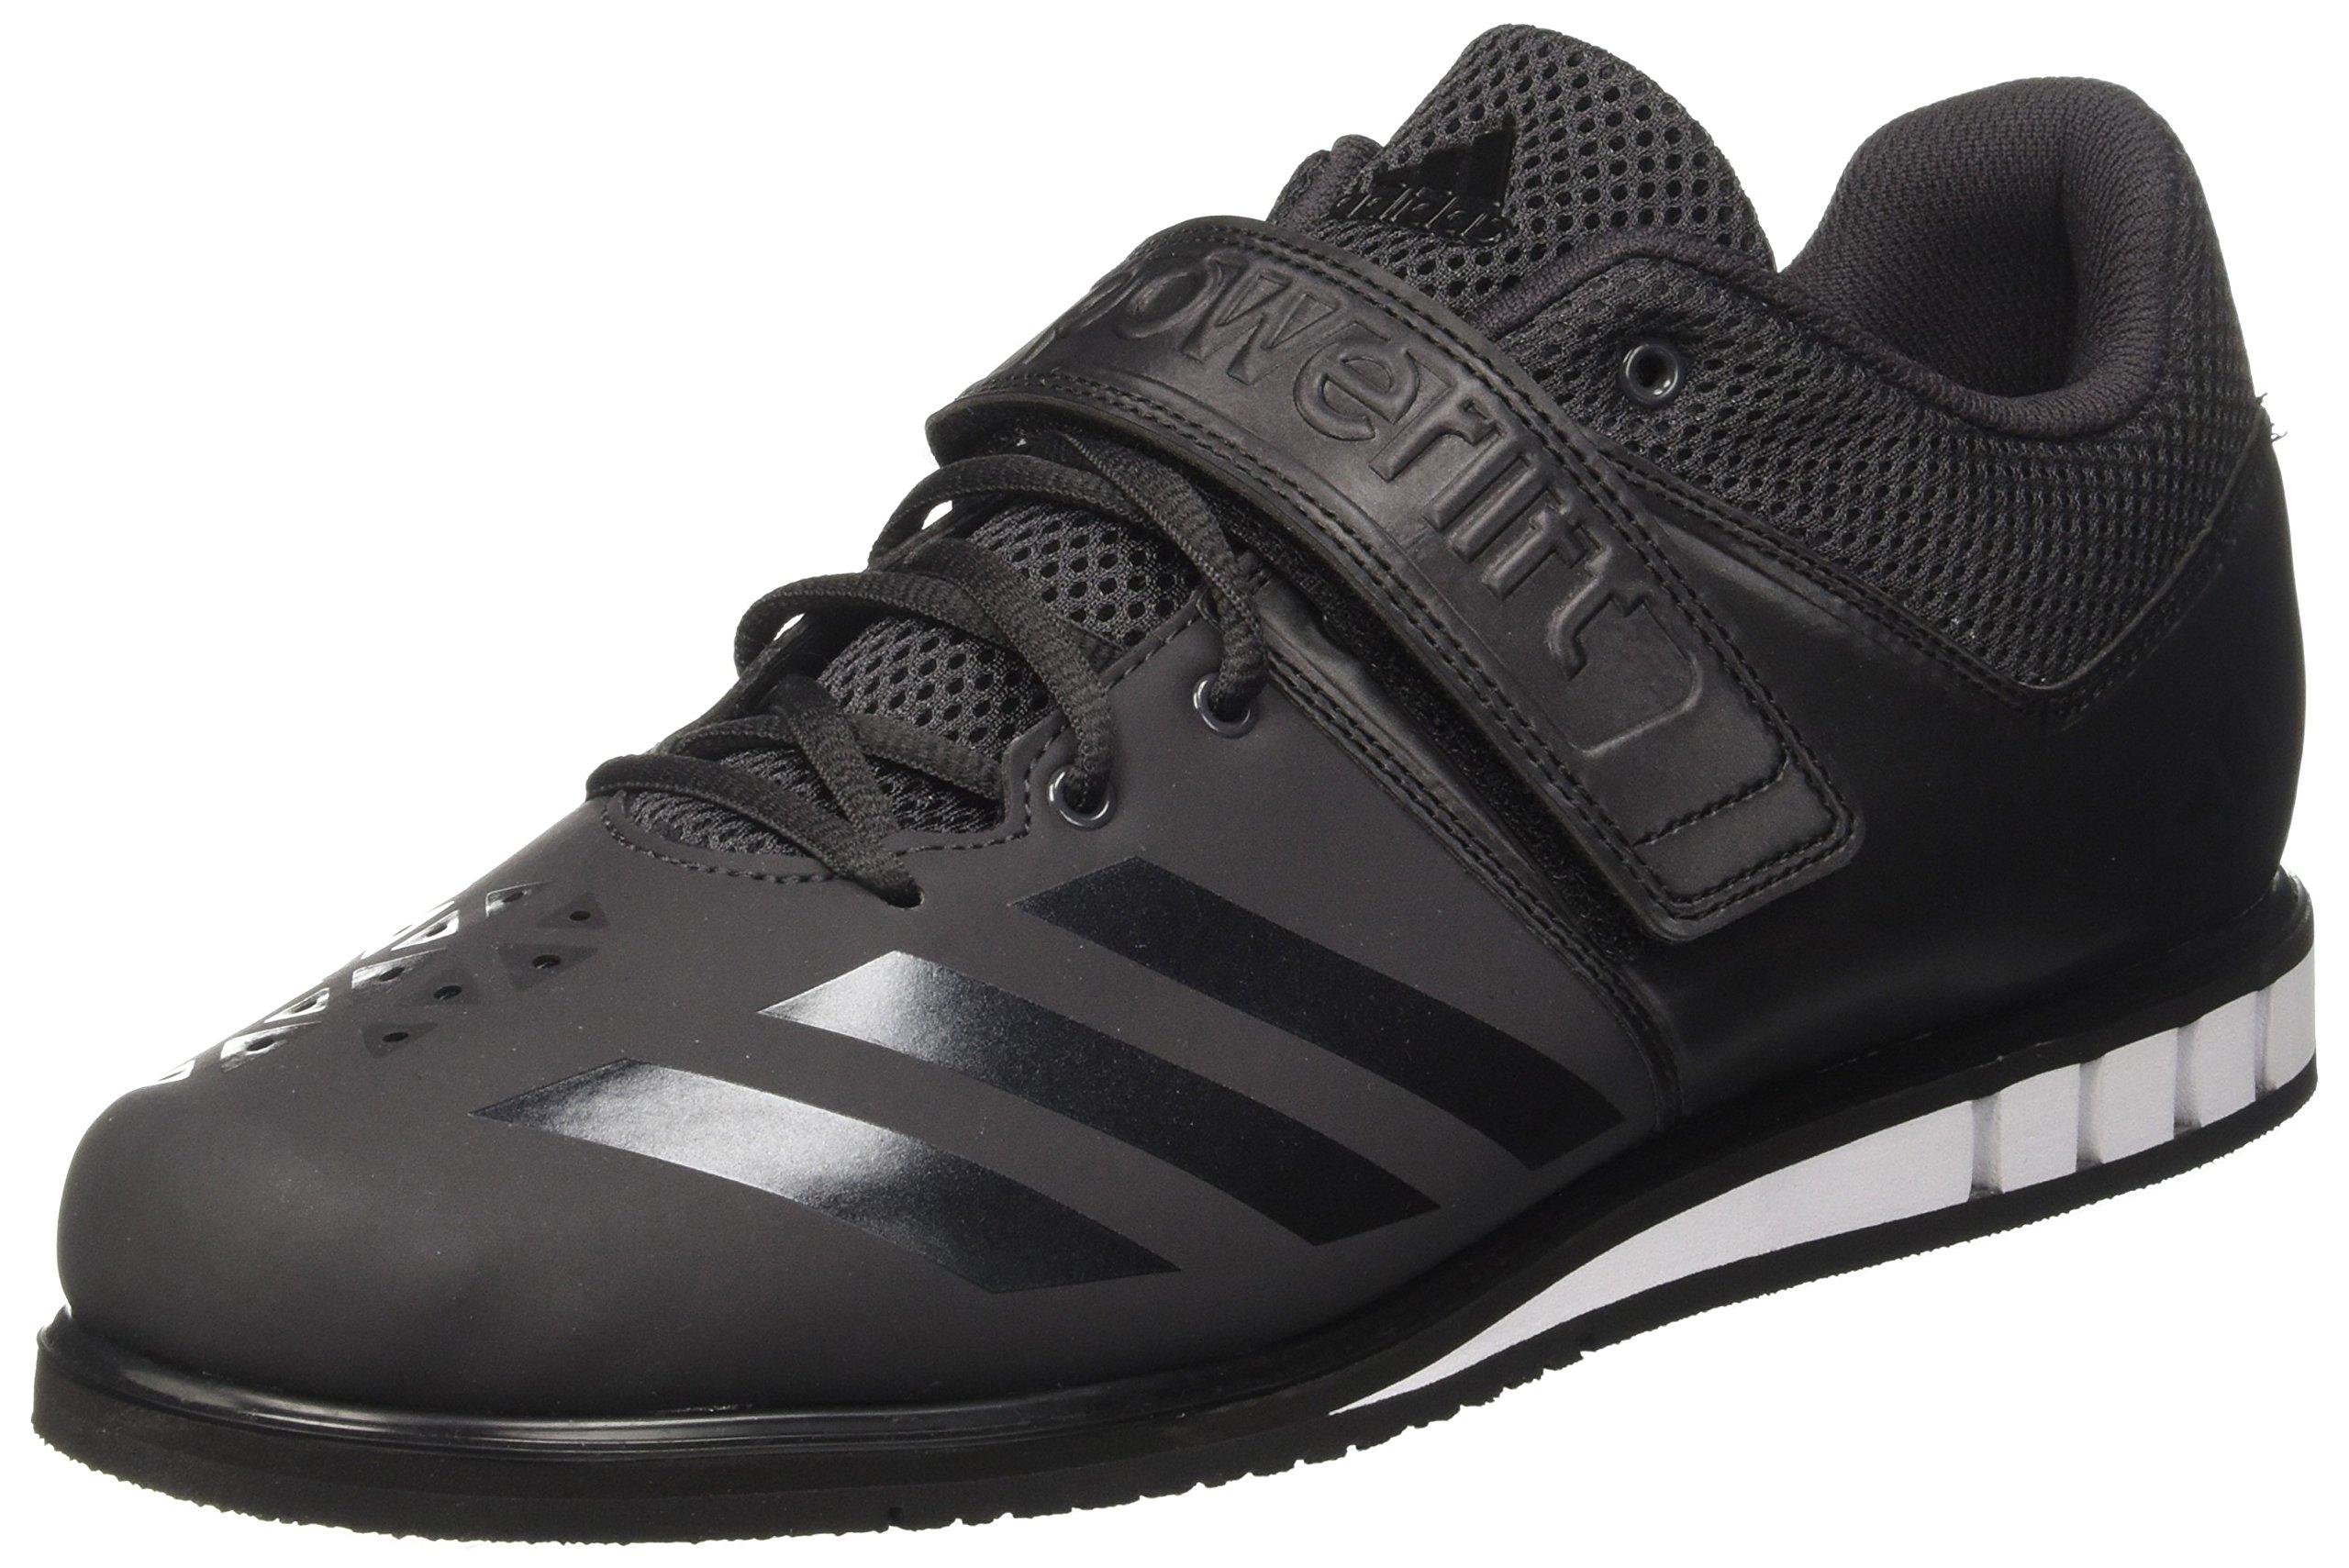 adidas Powerlift 3.1, Men's